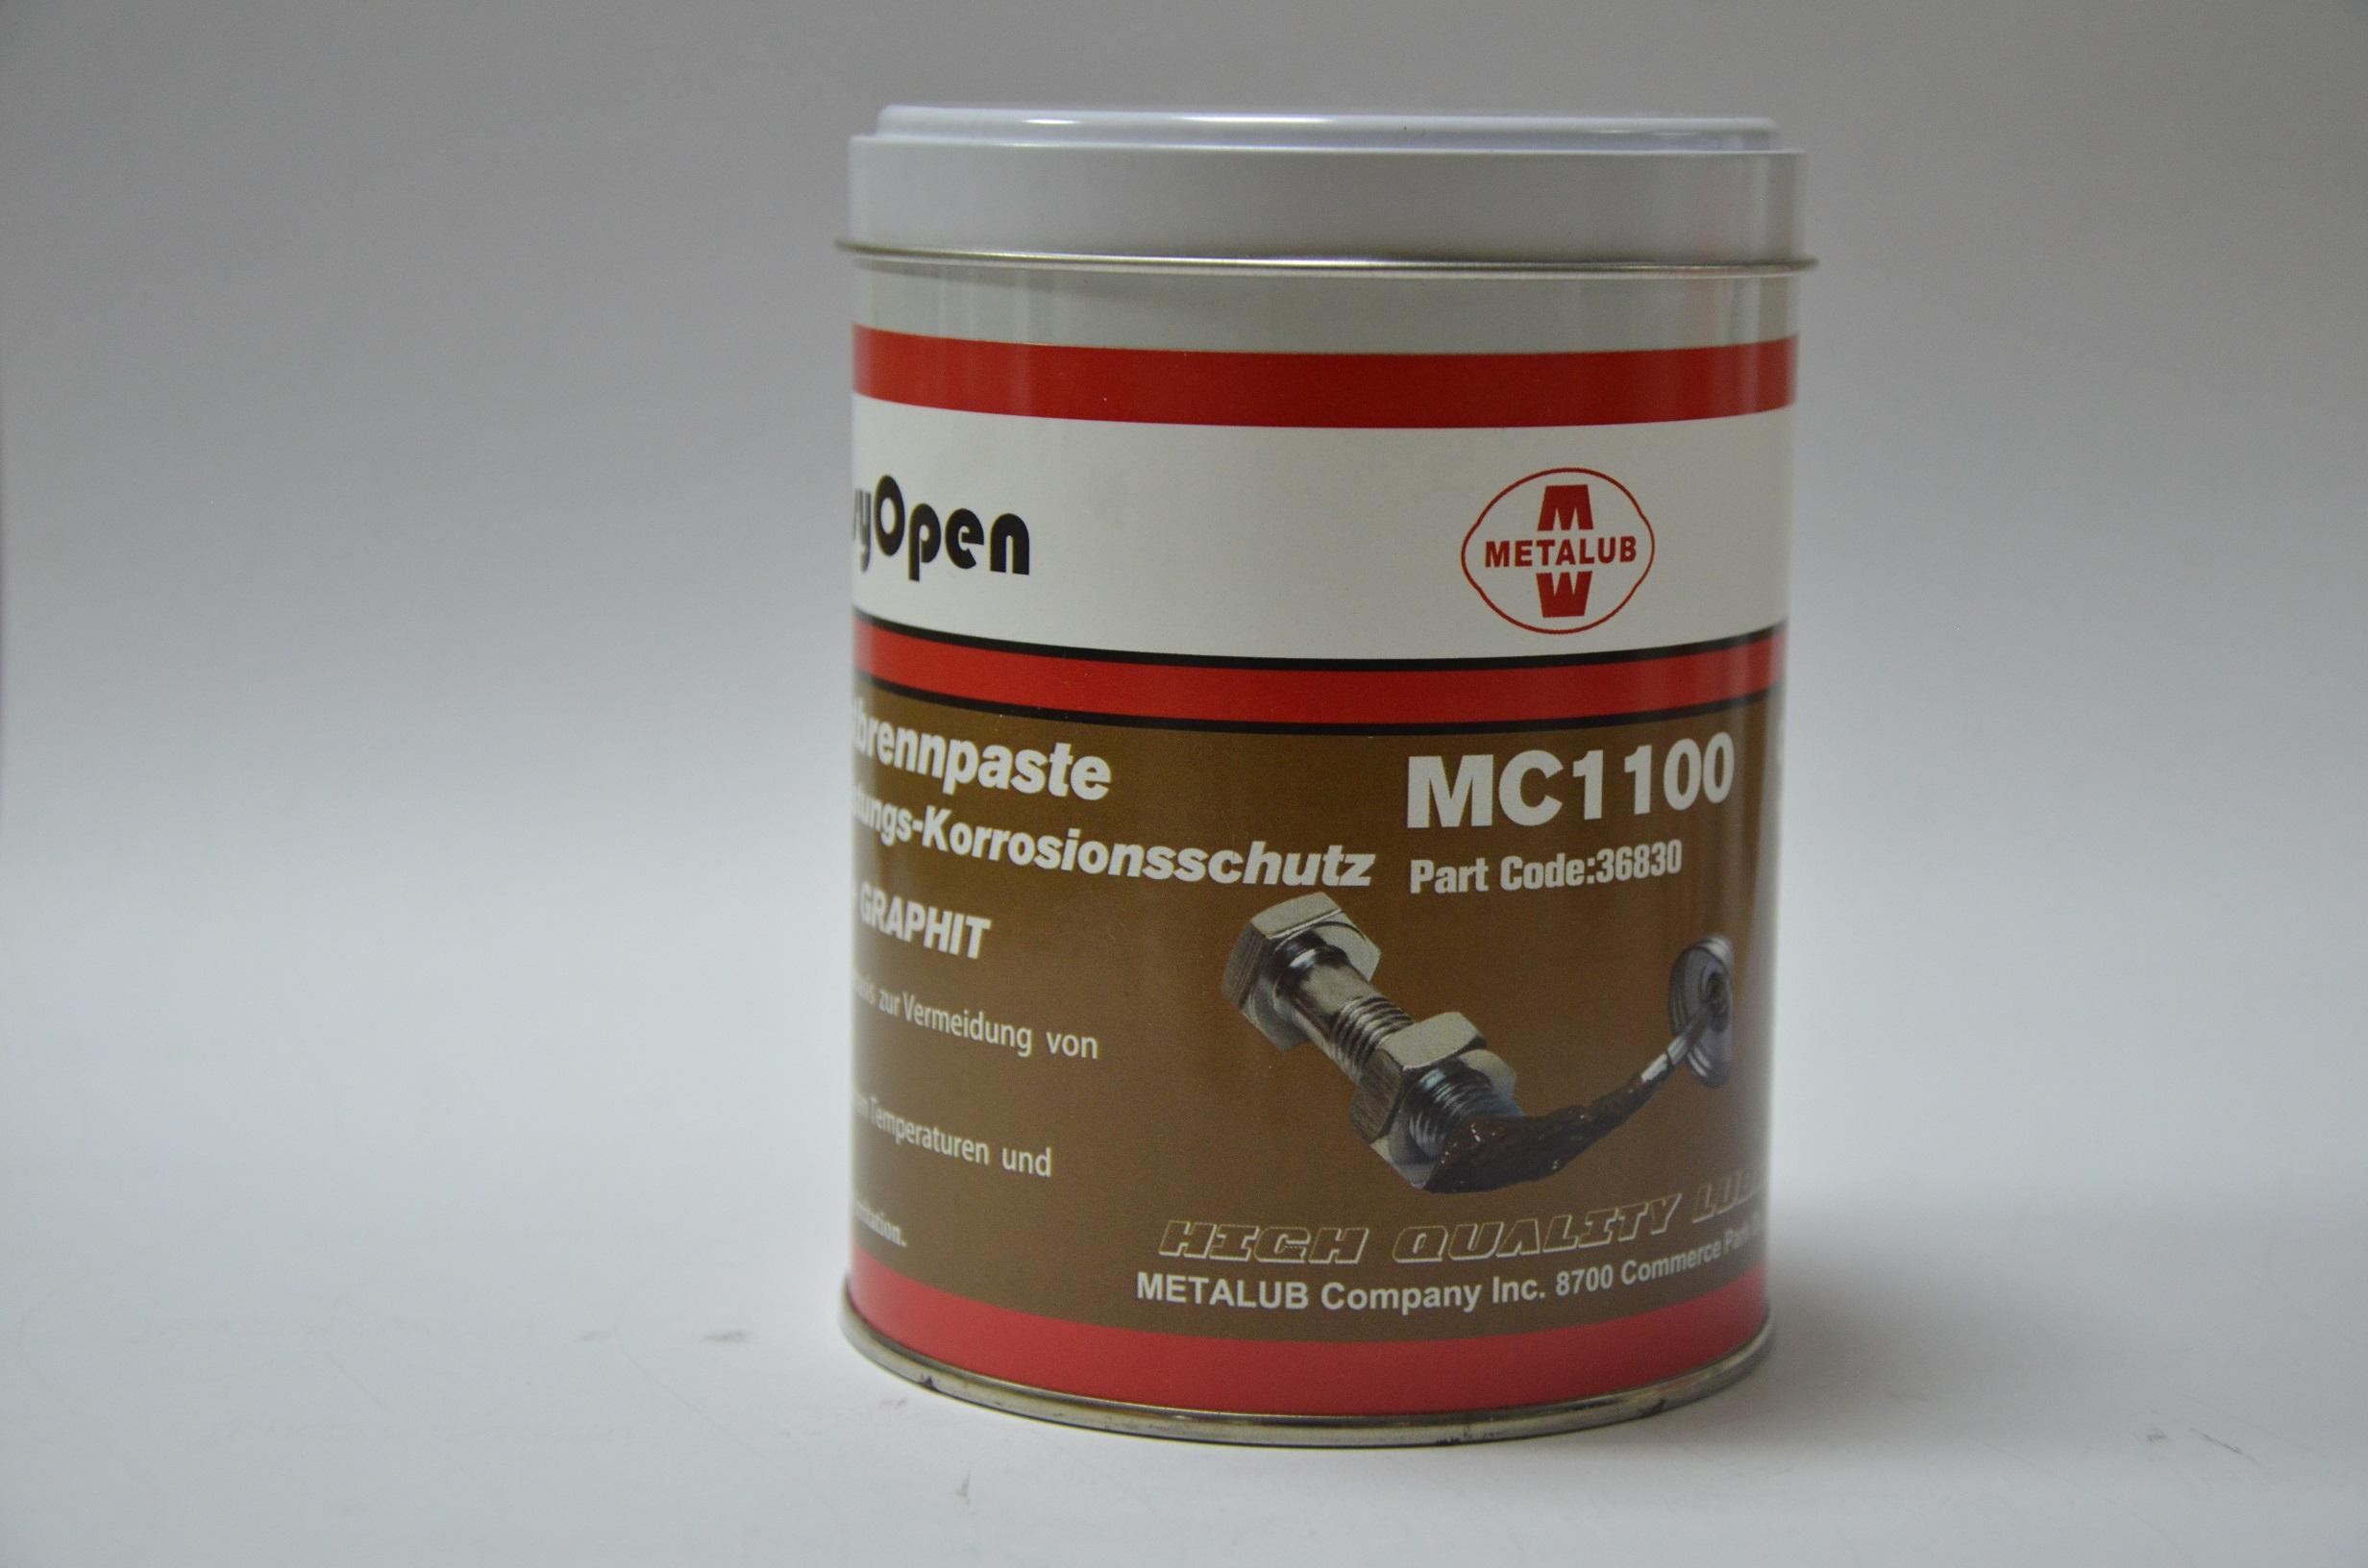 螺纹防卡剂COPPER ANTI-SEIZE METALUB MC1100.JPG